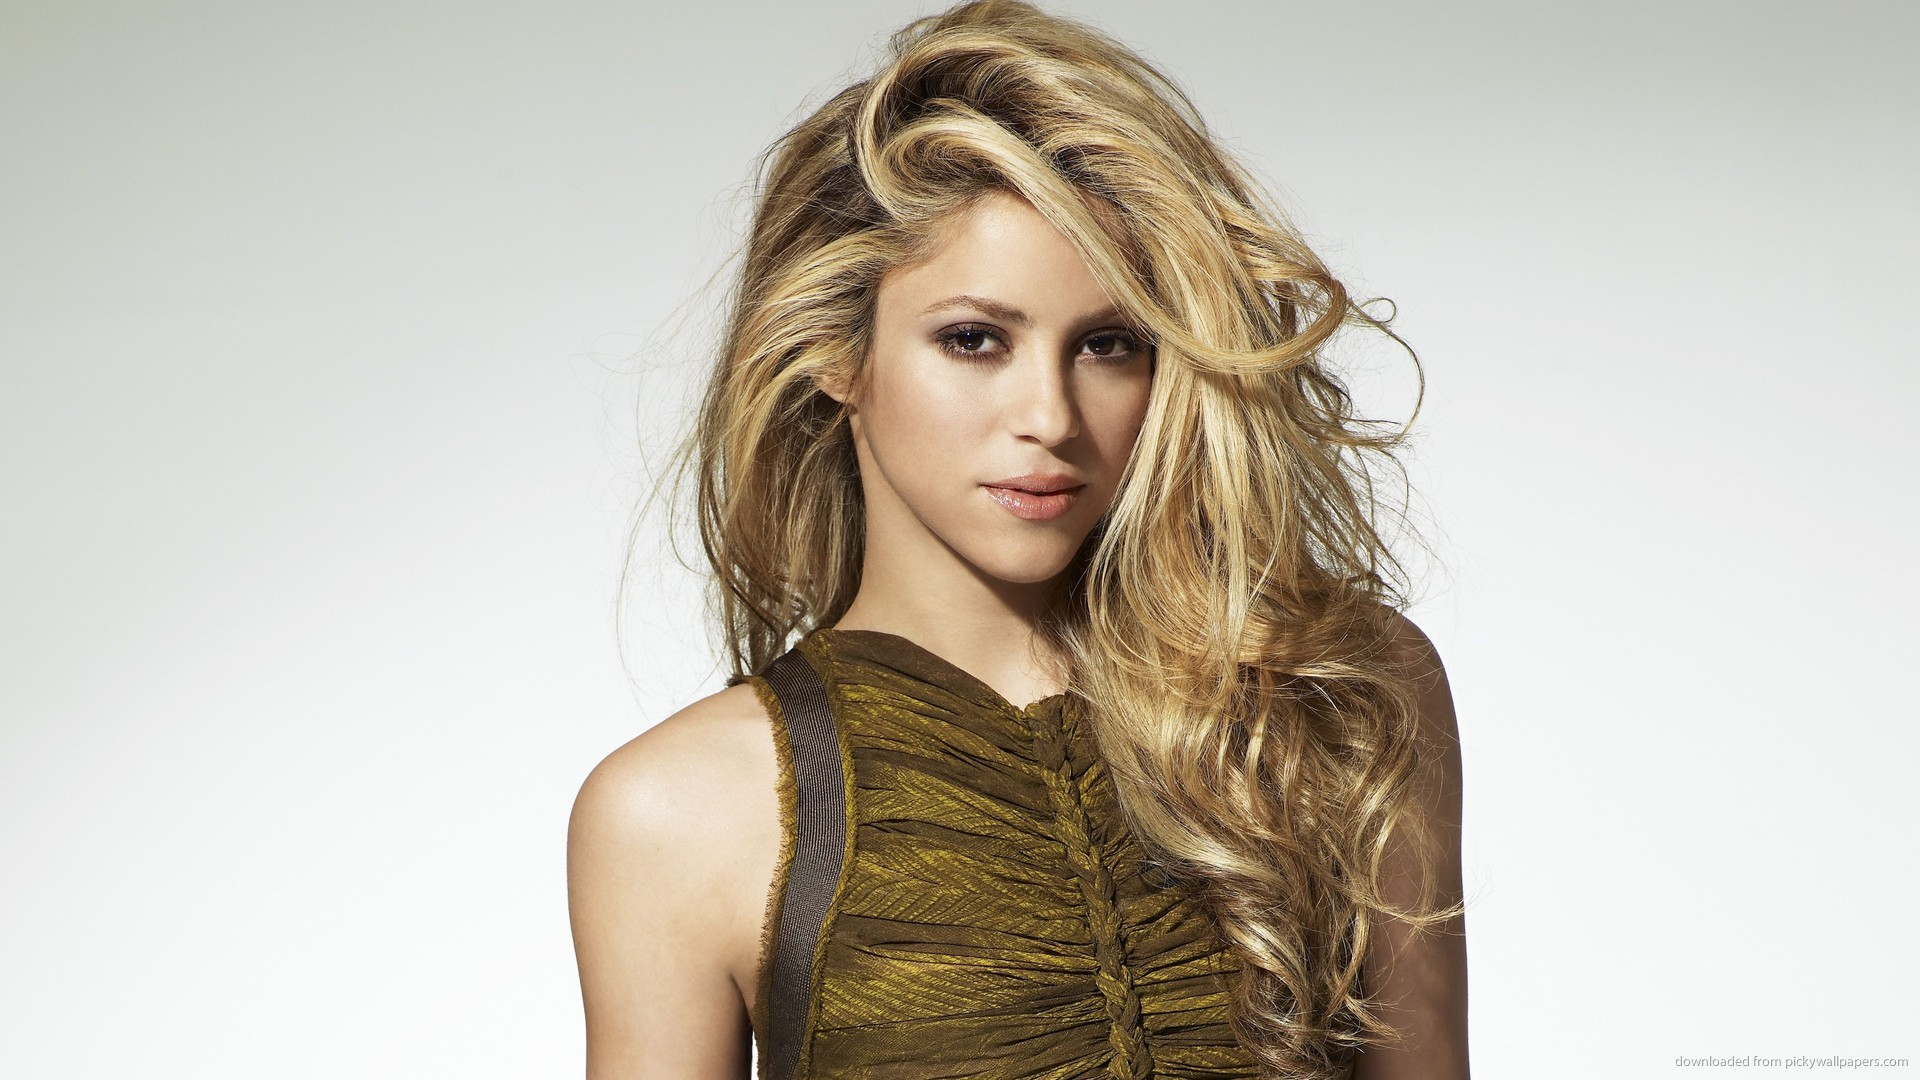 Celebrity Shakira Wallpaper HD 1 High Resolution Wallpaper Full Size 1920x1080